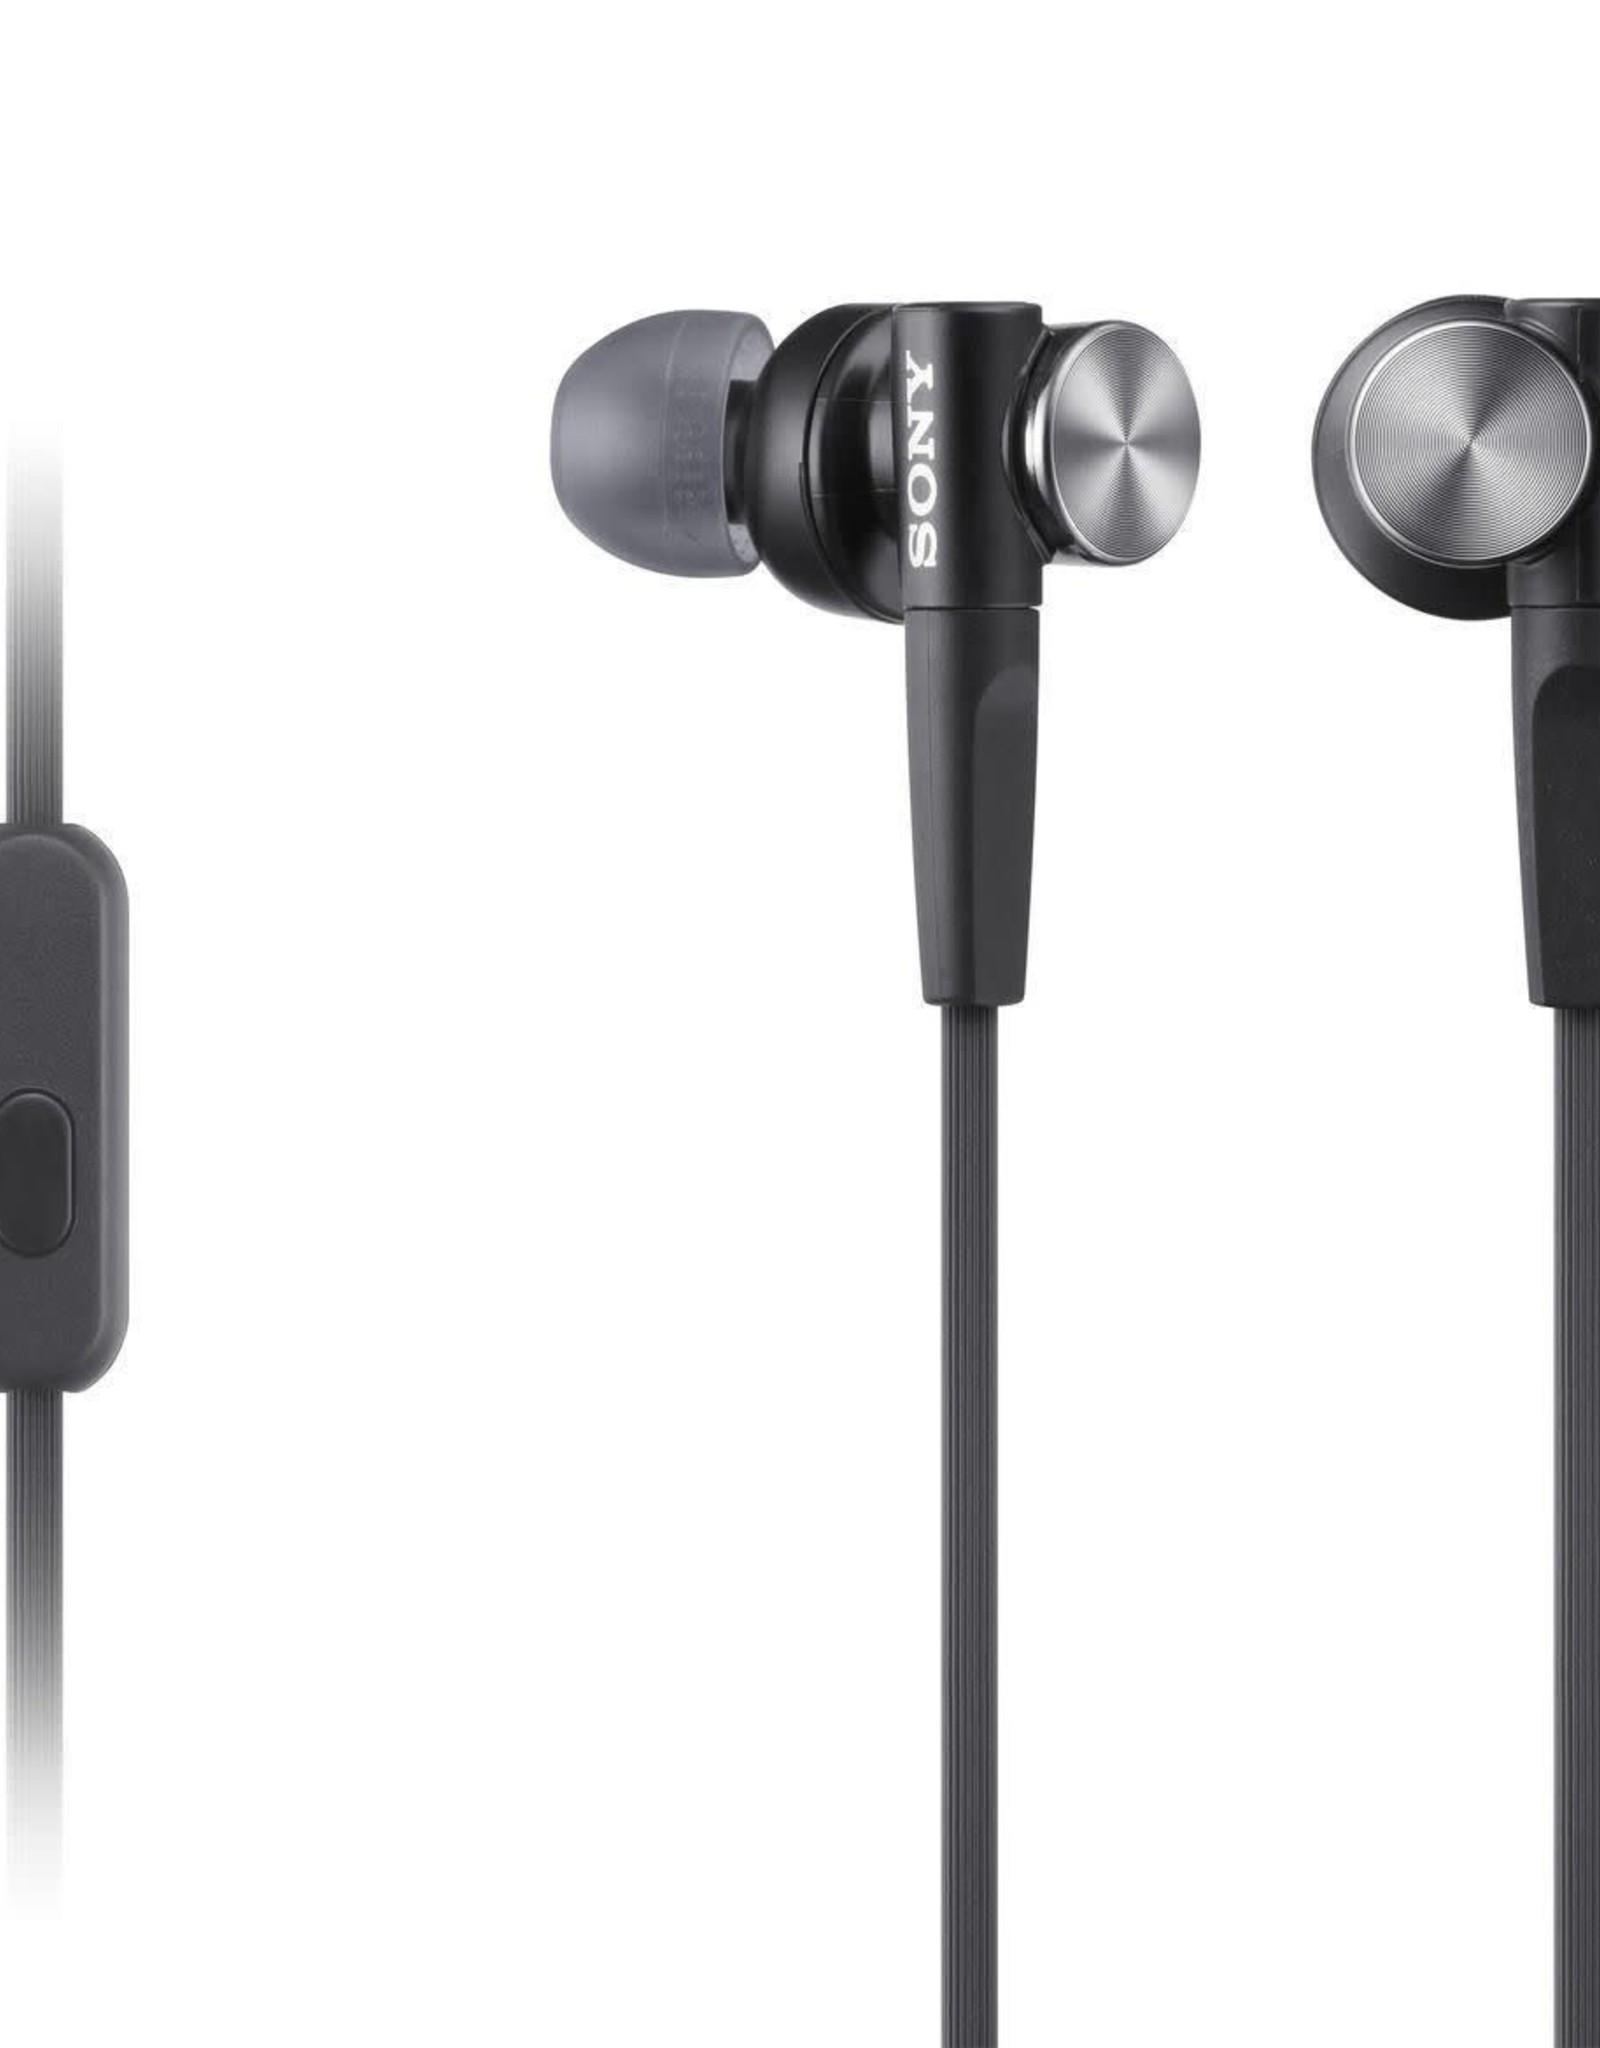 Sony Sony   In-ear Extra Bass Earbud Headphones (Black)   MDR-XB50AP/B